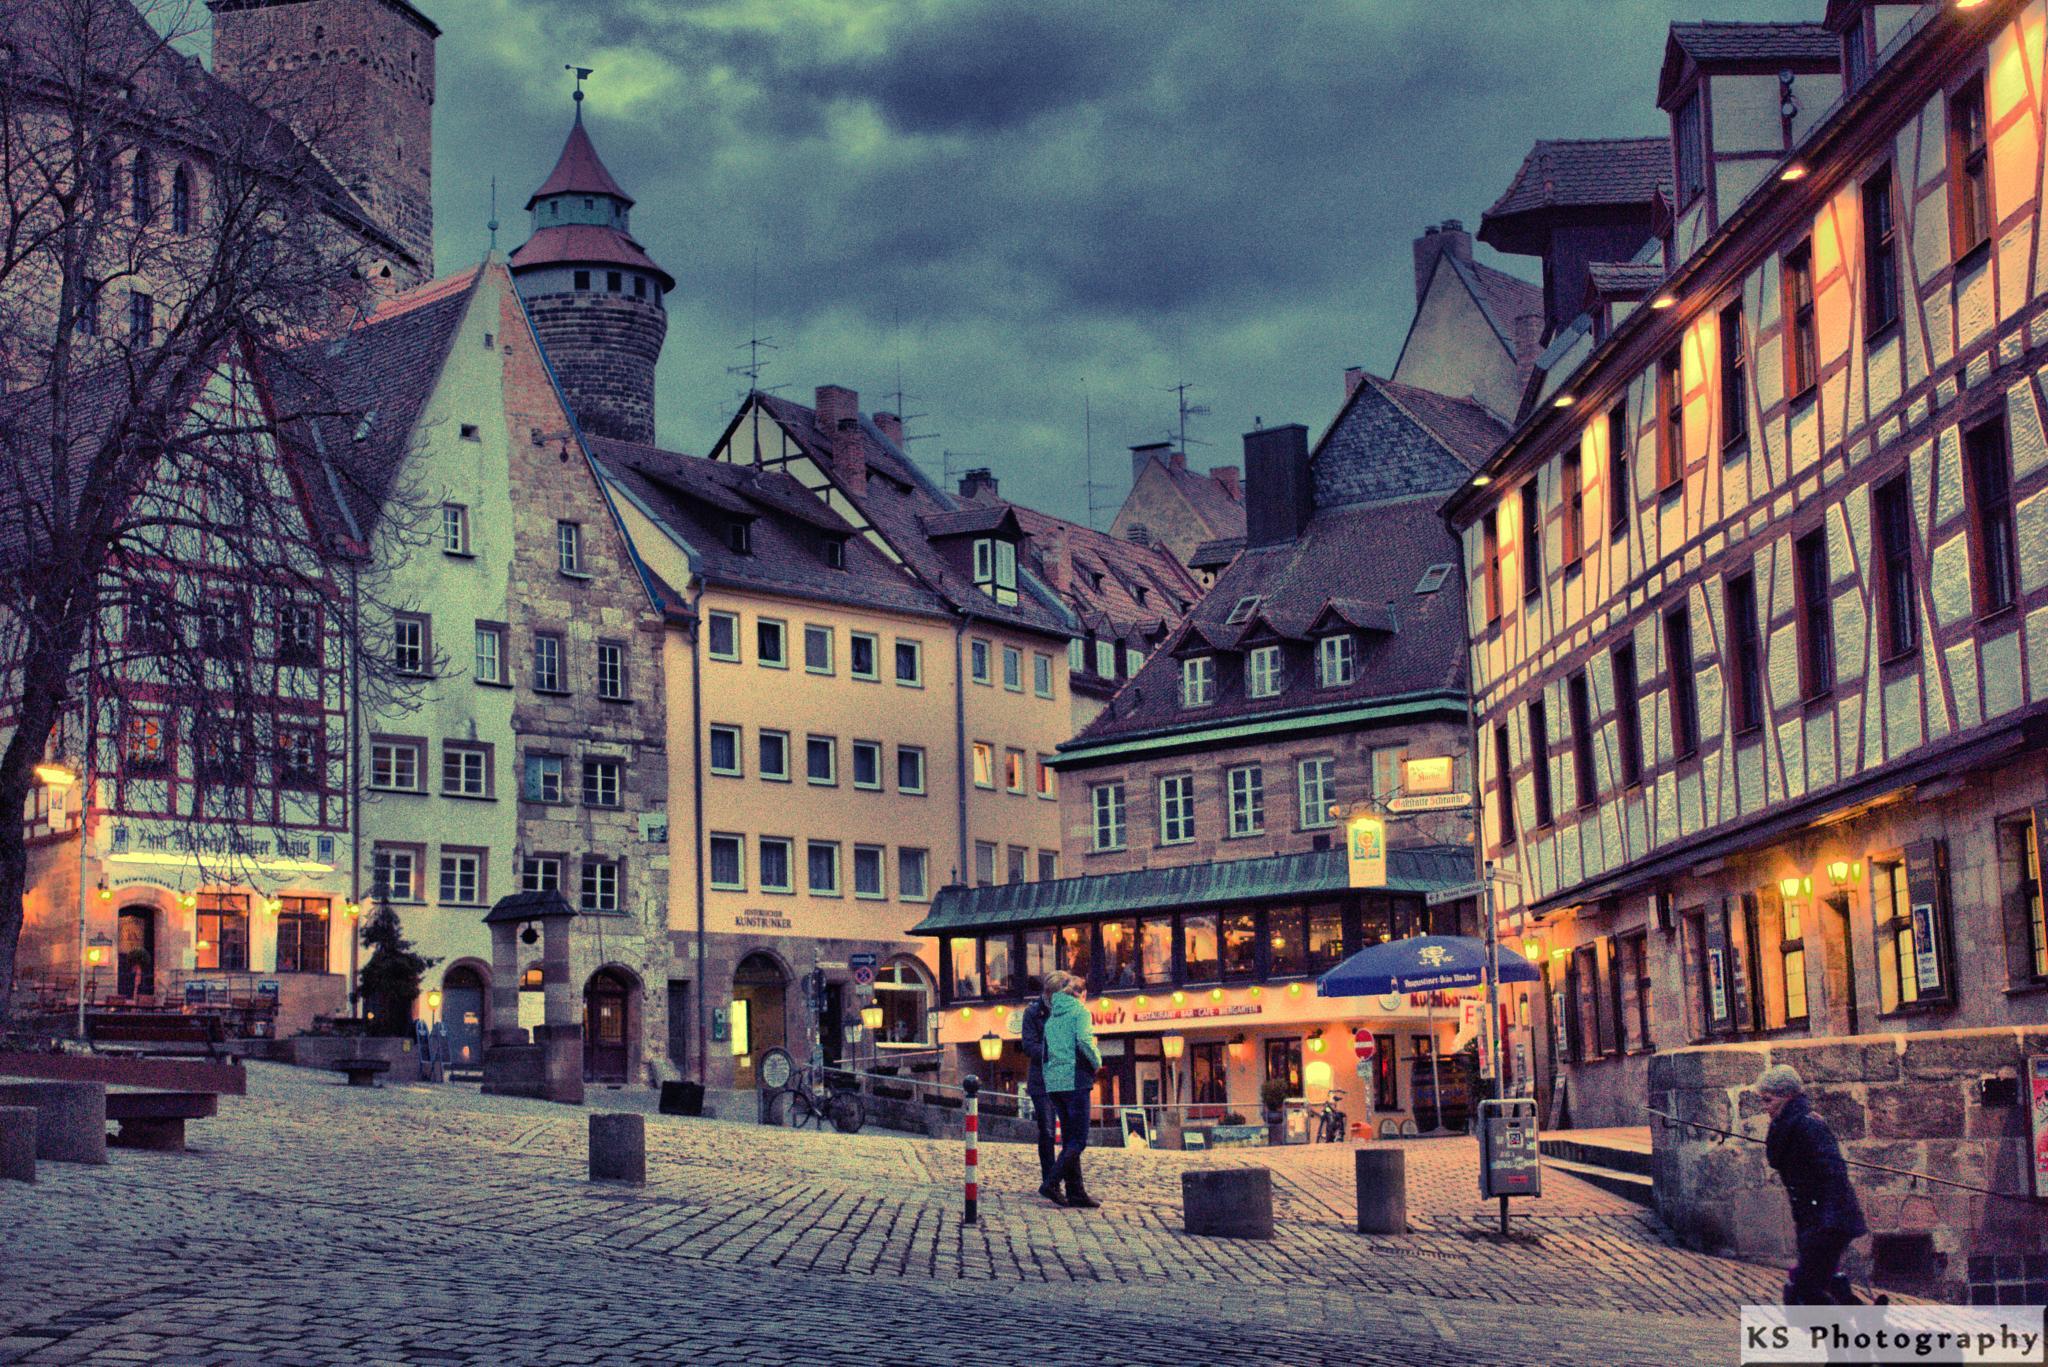 Evening in Nuerembergs Old Town by Klaus Schenker